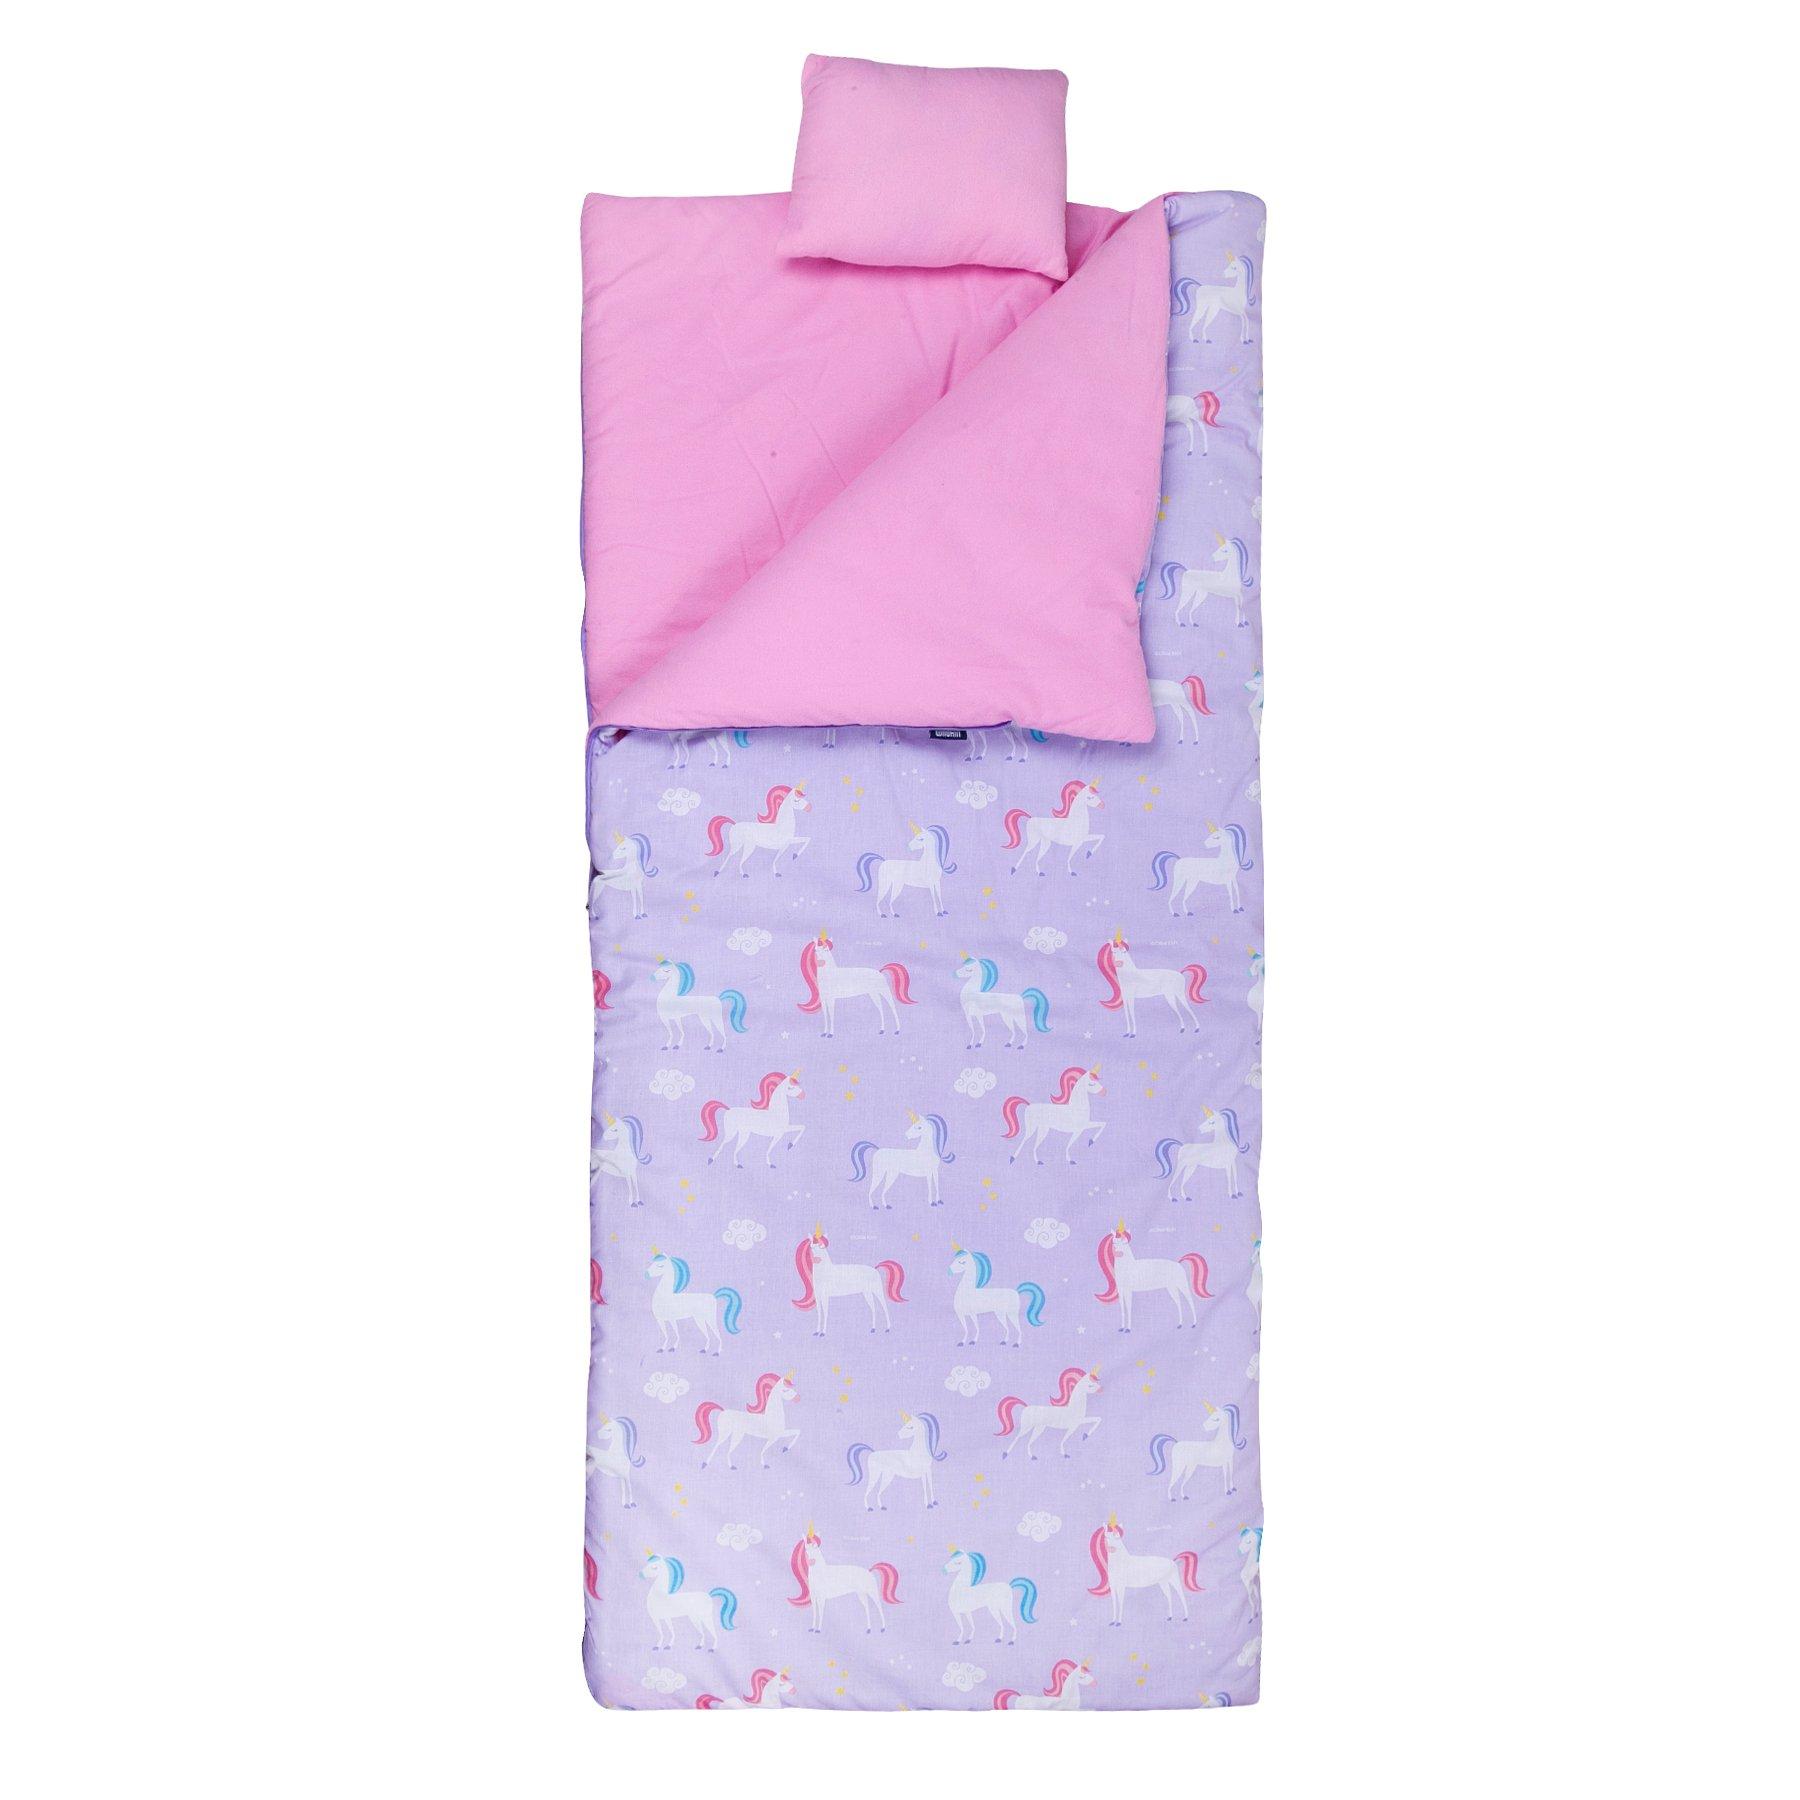 Wildkin Original Sleeping Pillowcase & Storage Bag, Premium Cotton & Microfiber Blend Exterior, Ages 5-12, Unicorn